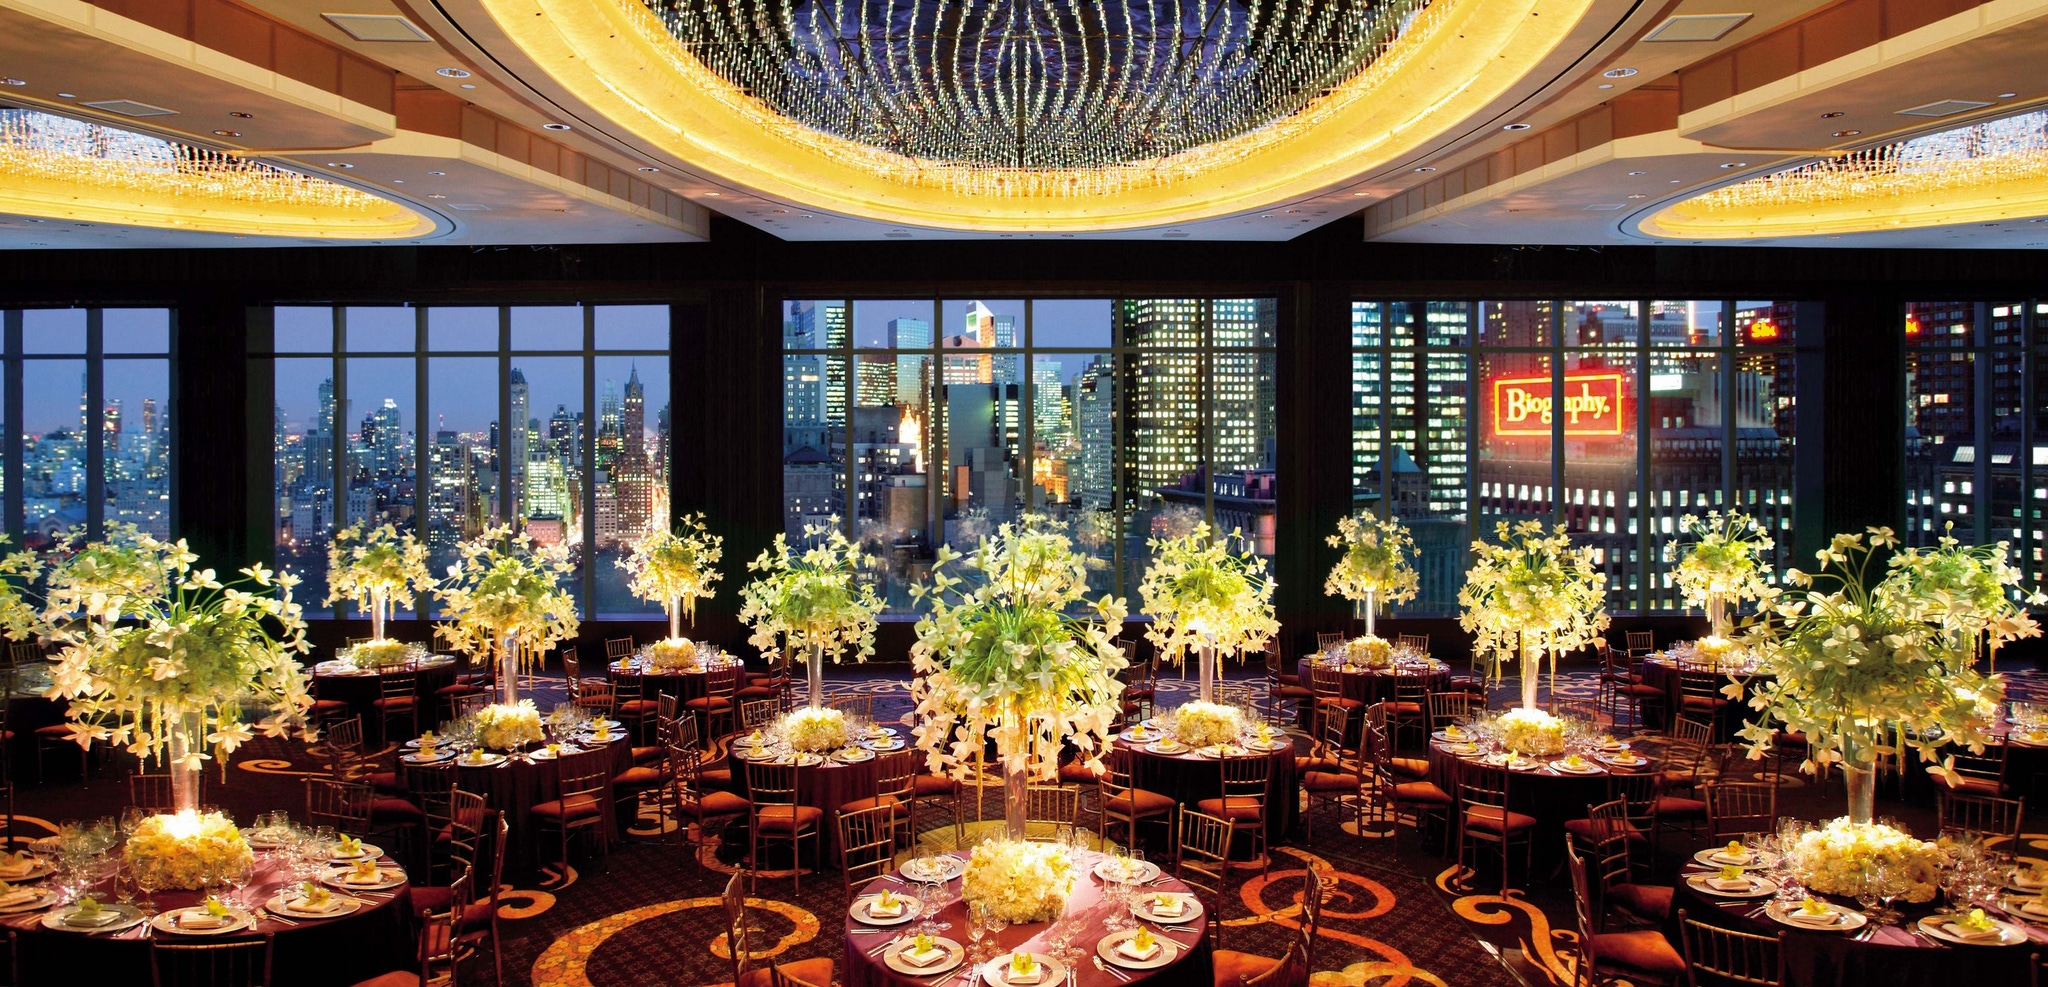 The Mandarin Ballroom at Mandarin Oriental, New York